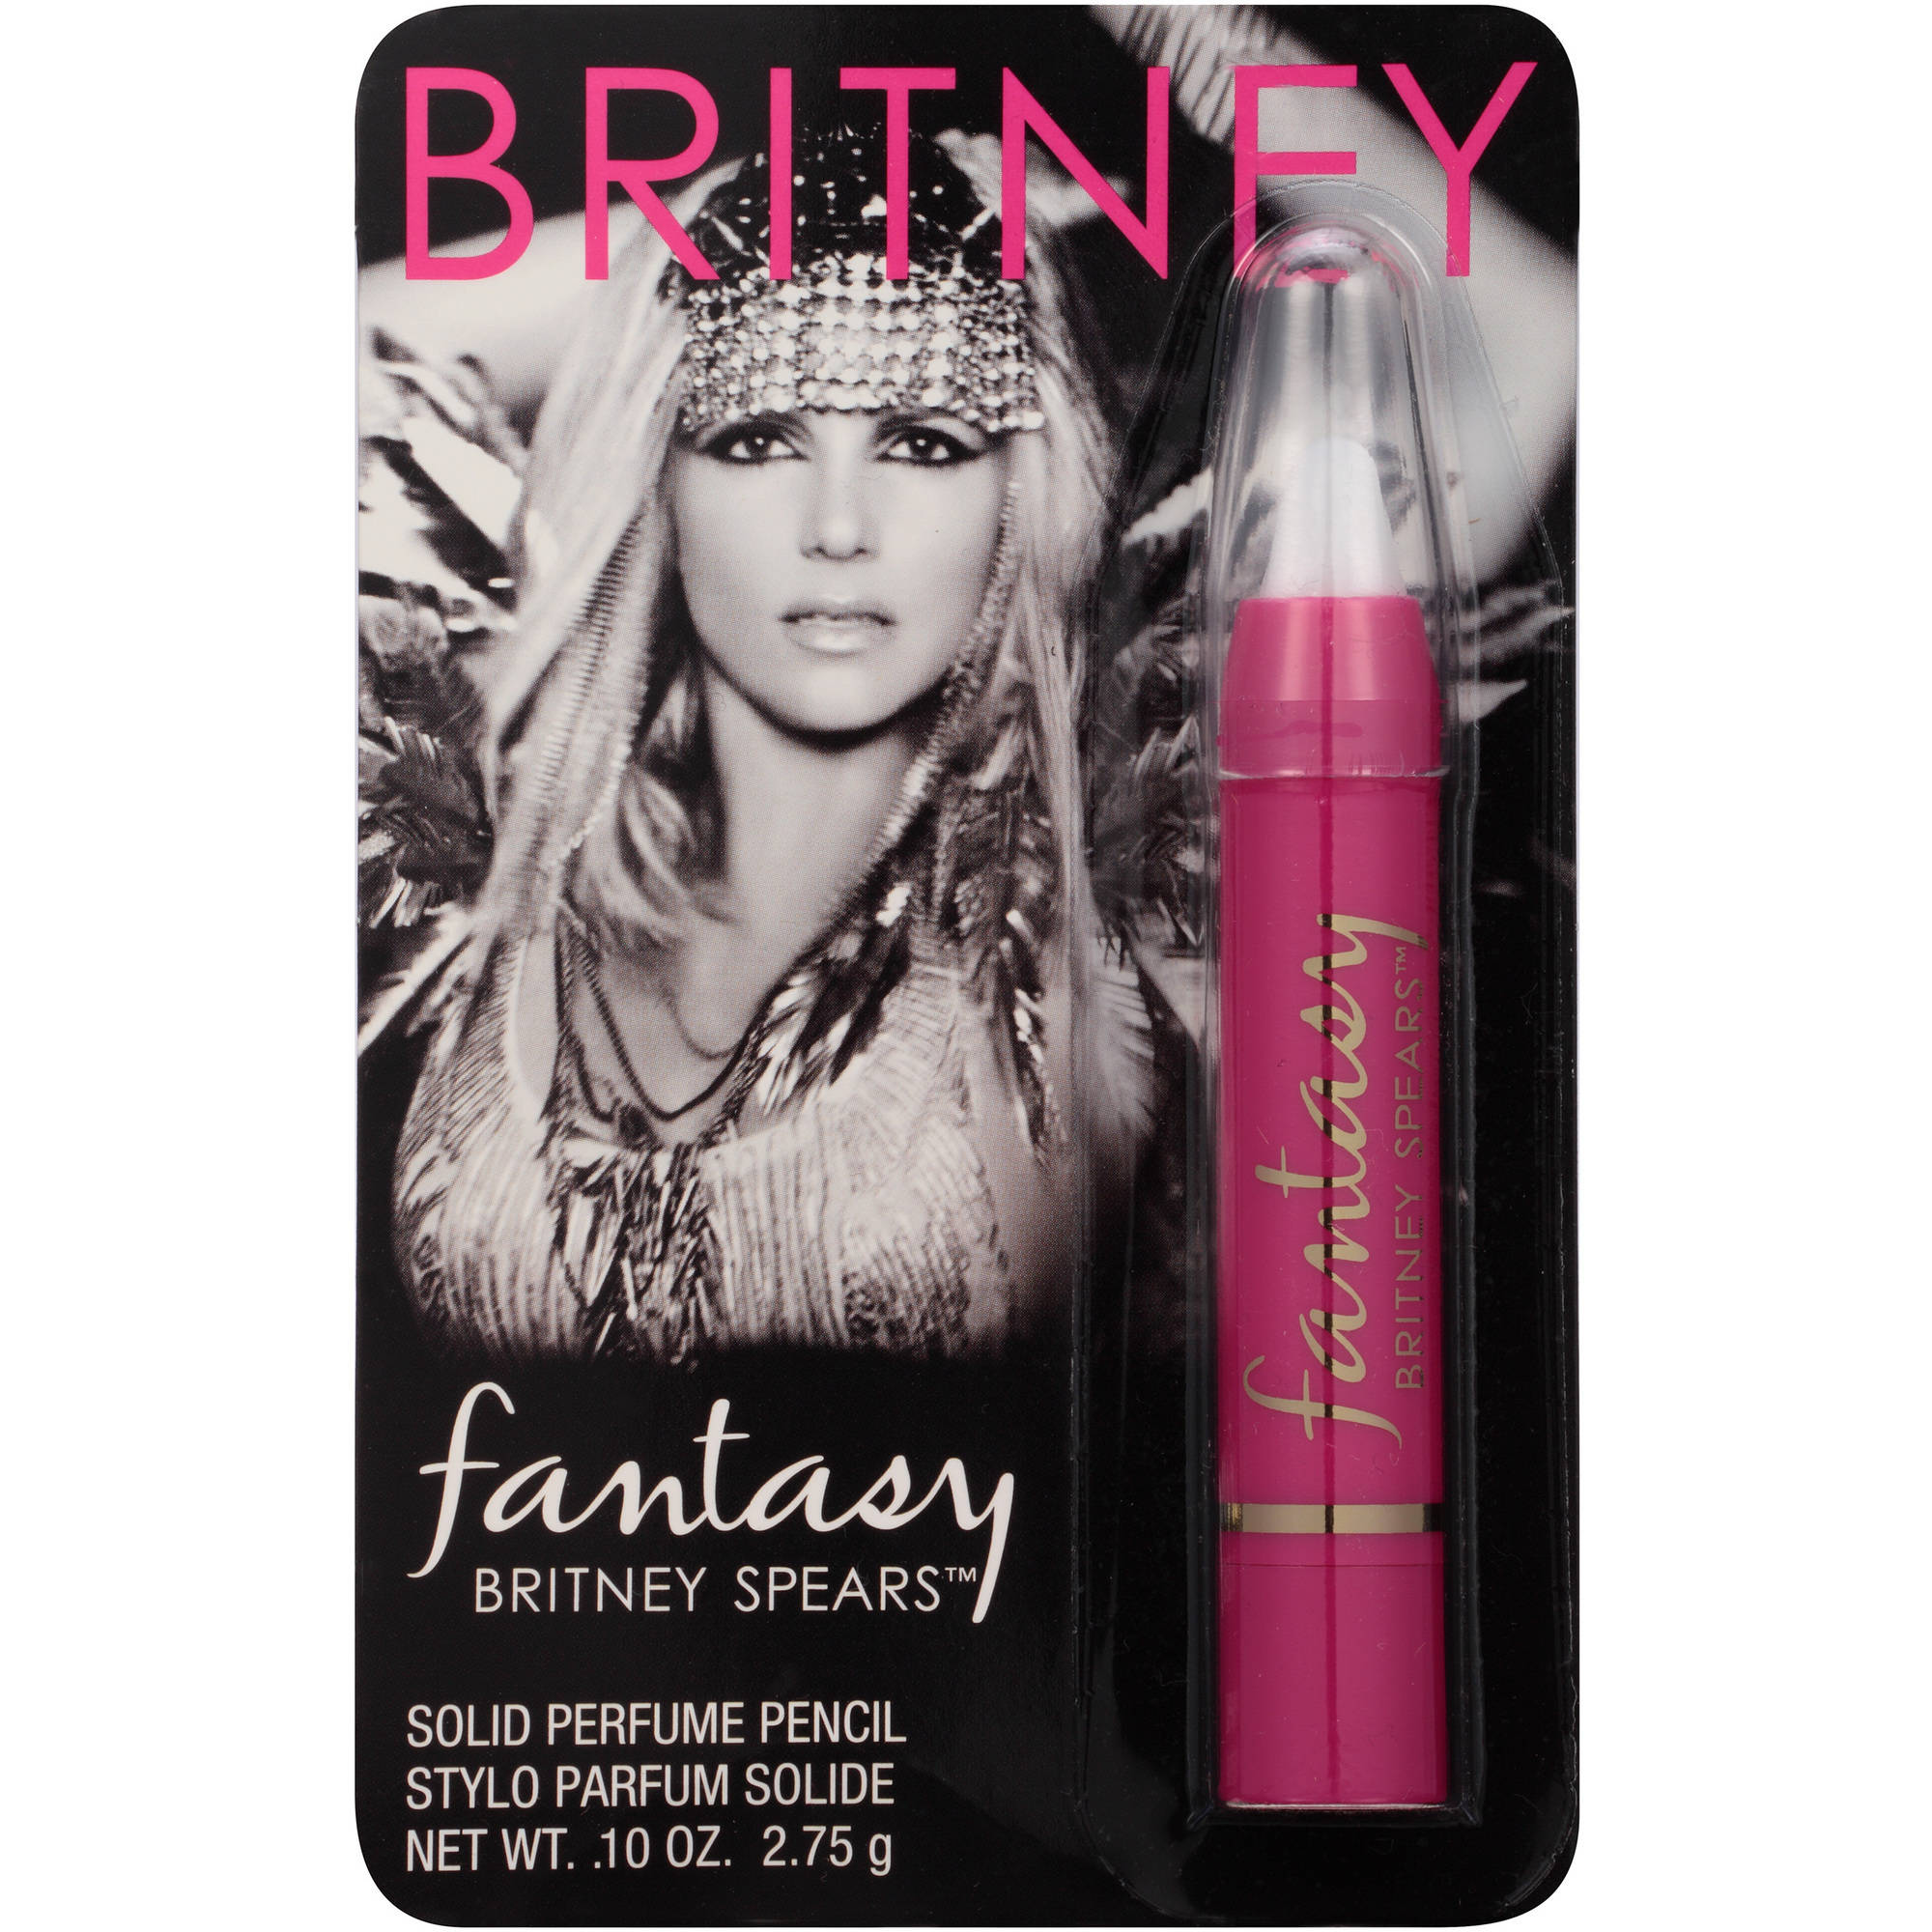 Britney Spears Fantasy Solid Perfume Pencil, .10 oz